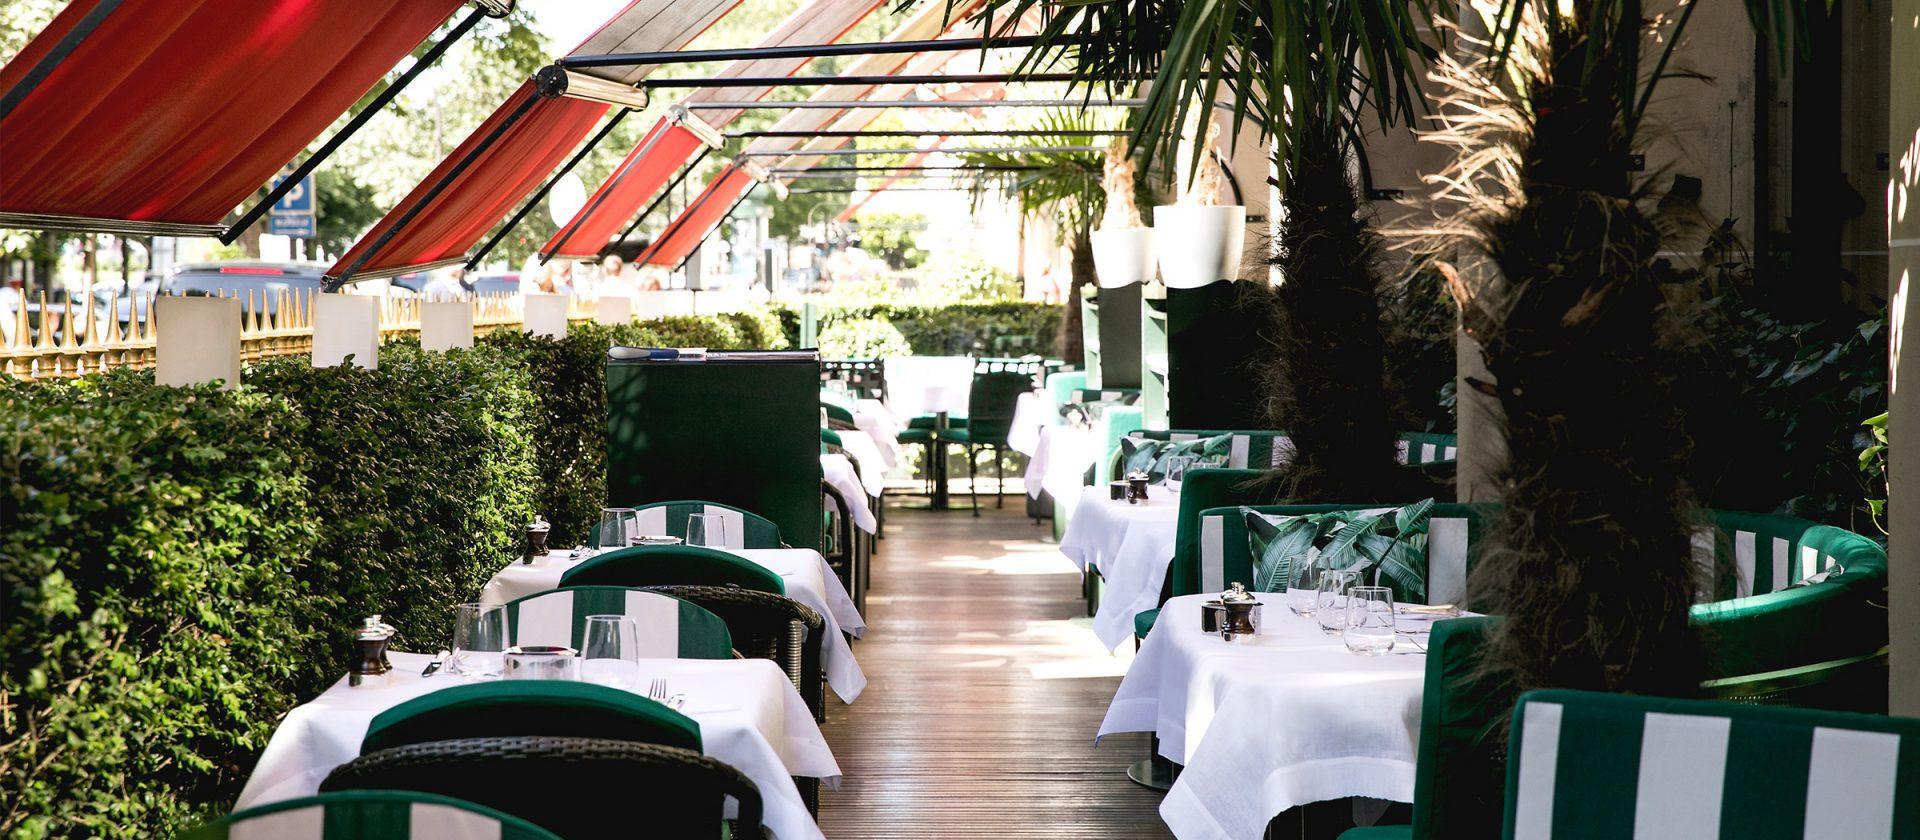 paris-plaza-athenee-la-terrasse-montaigne-cabana-1920x840